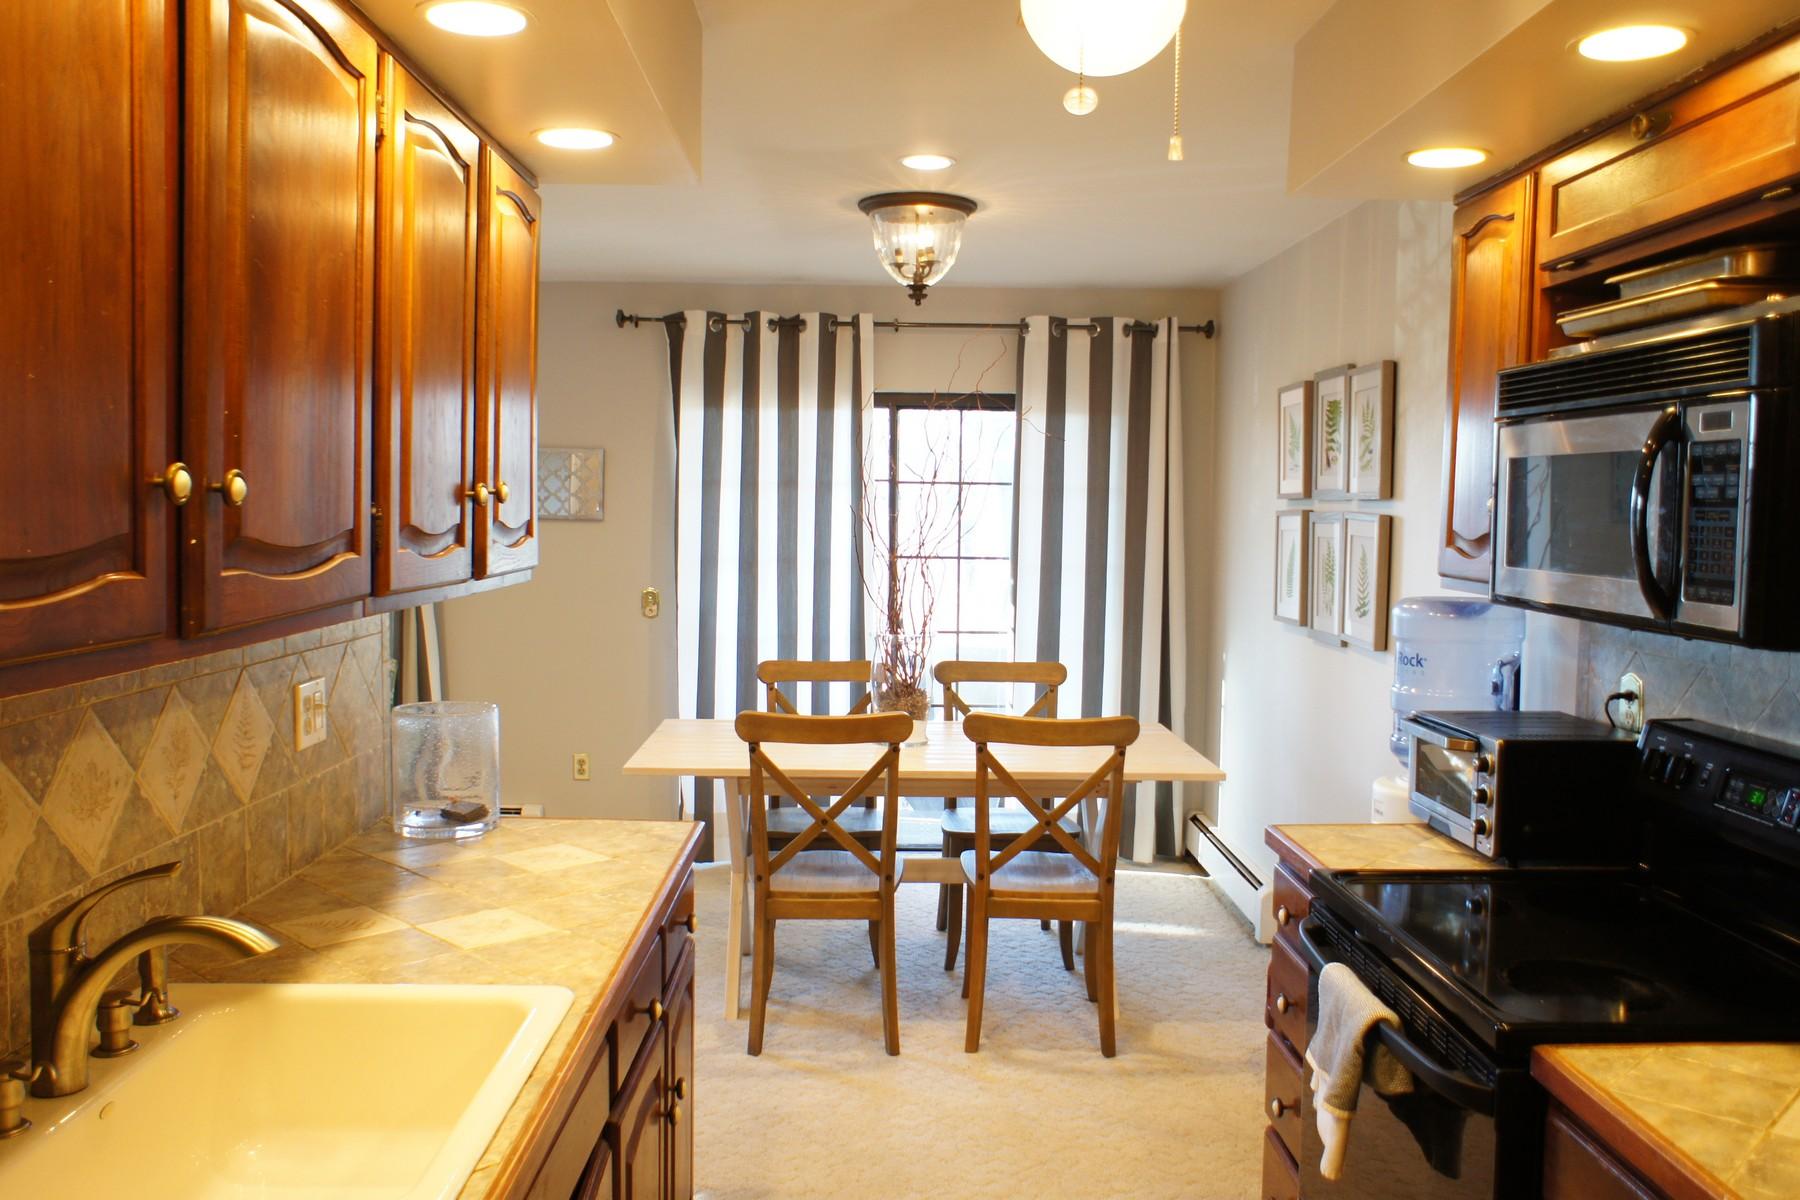 rentals property at Spacious Two Bedroom Top Floor Unit in Rolling Ridge